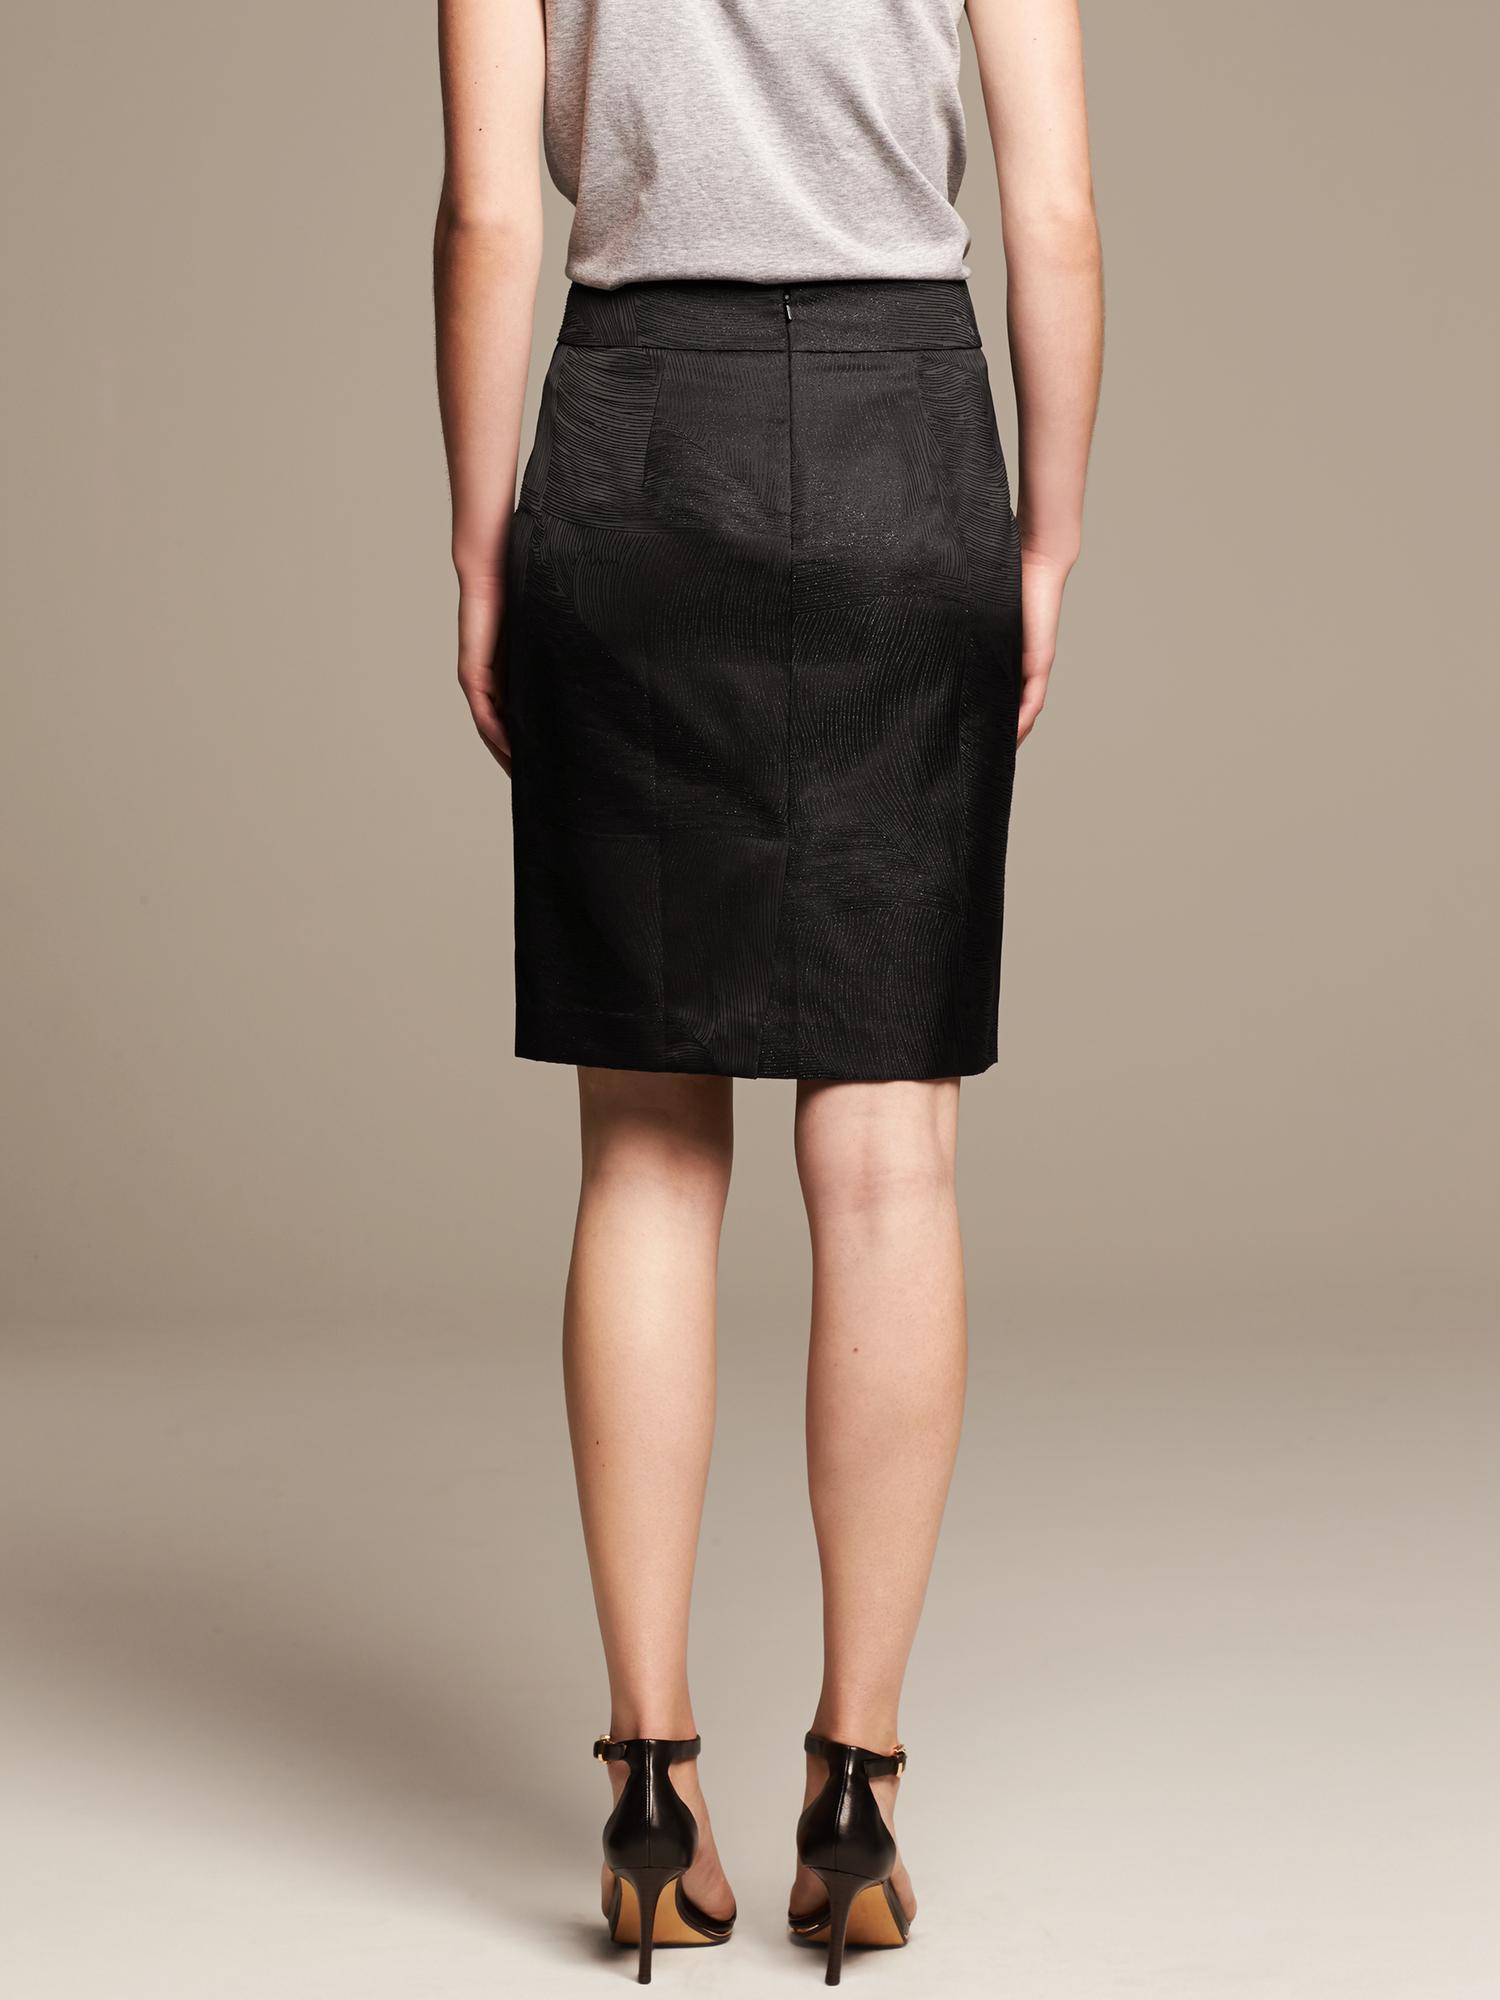 banana republic br monogram shine pencil skirt in black lyst